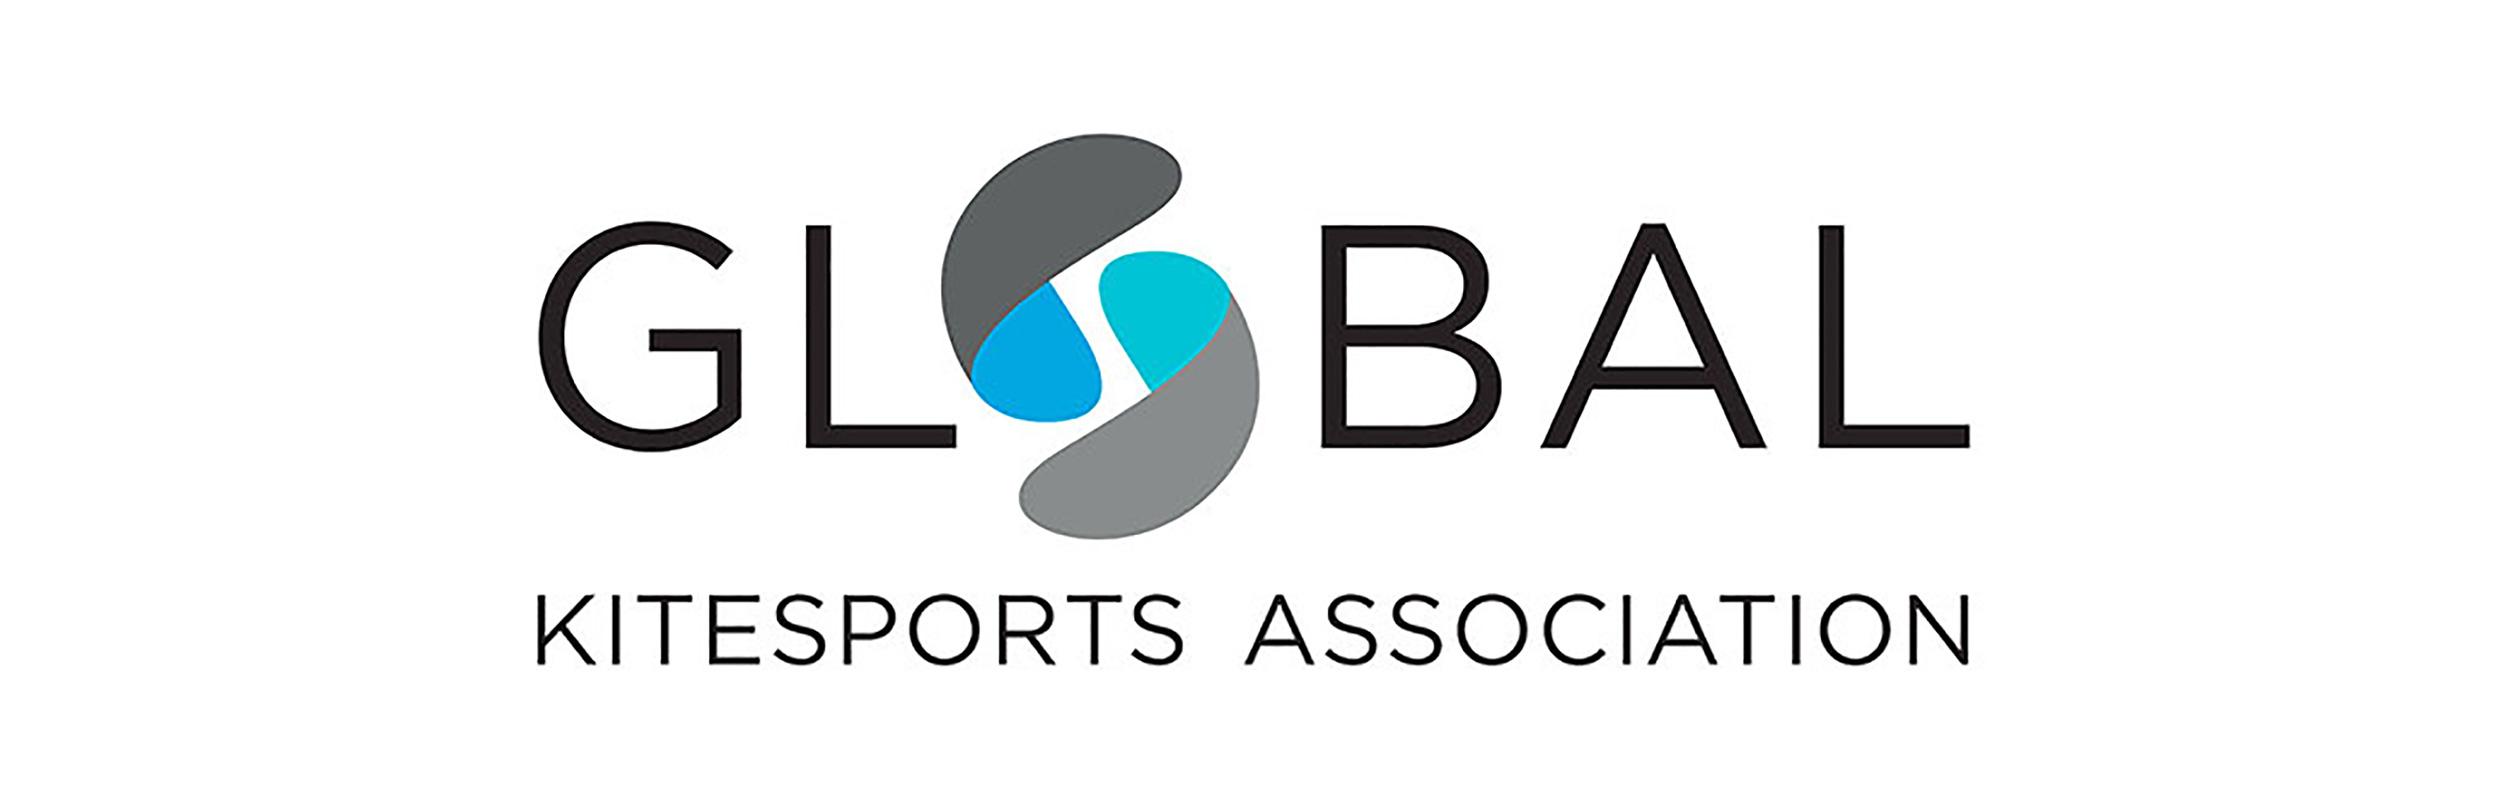 GKA - Global Kitesports Association